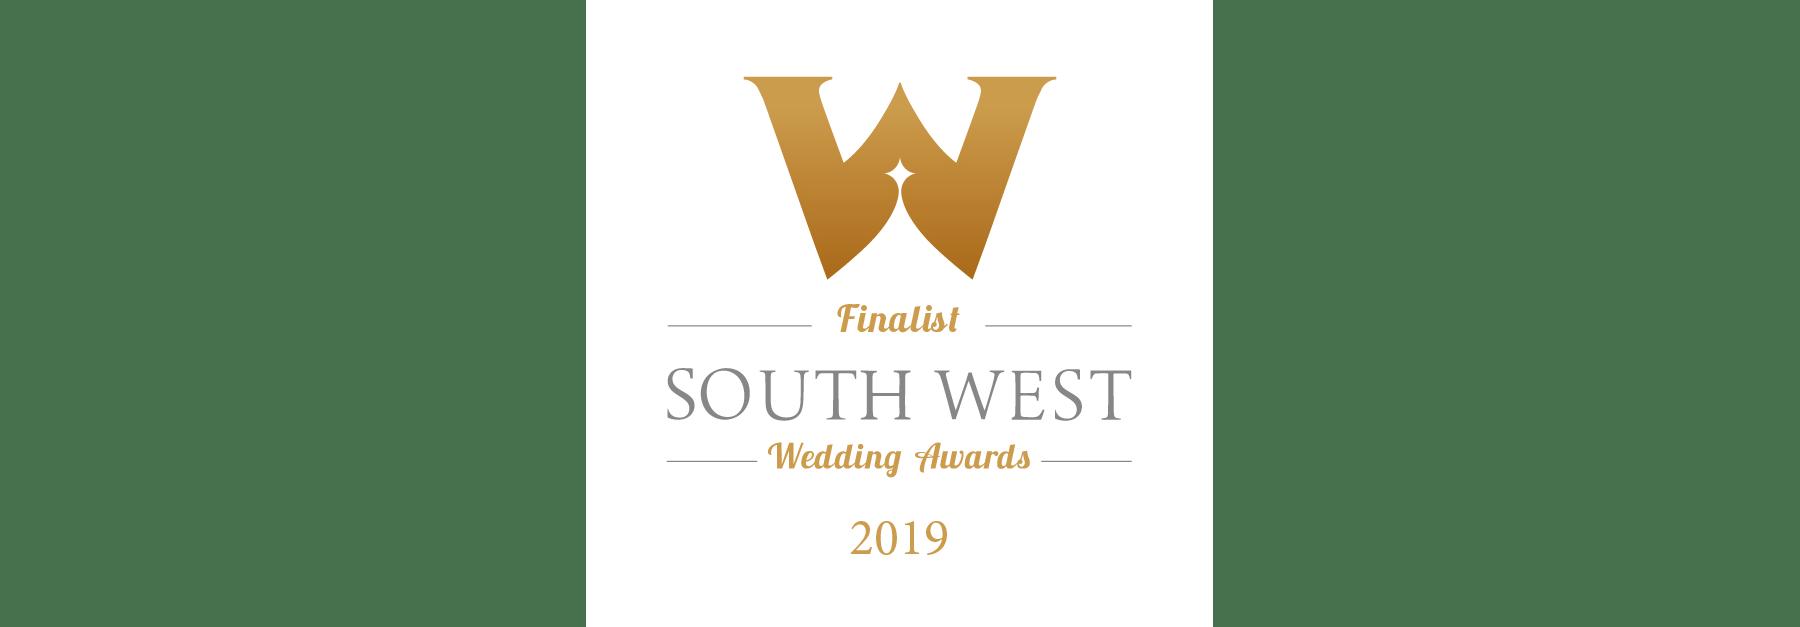 Seadog Foods South West Wedding Awards Finalists 2019